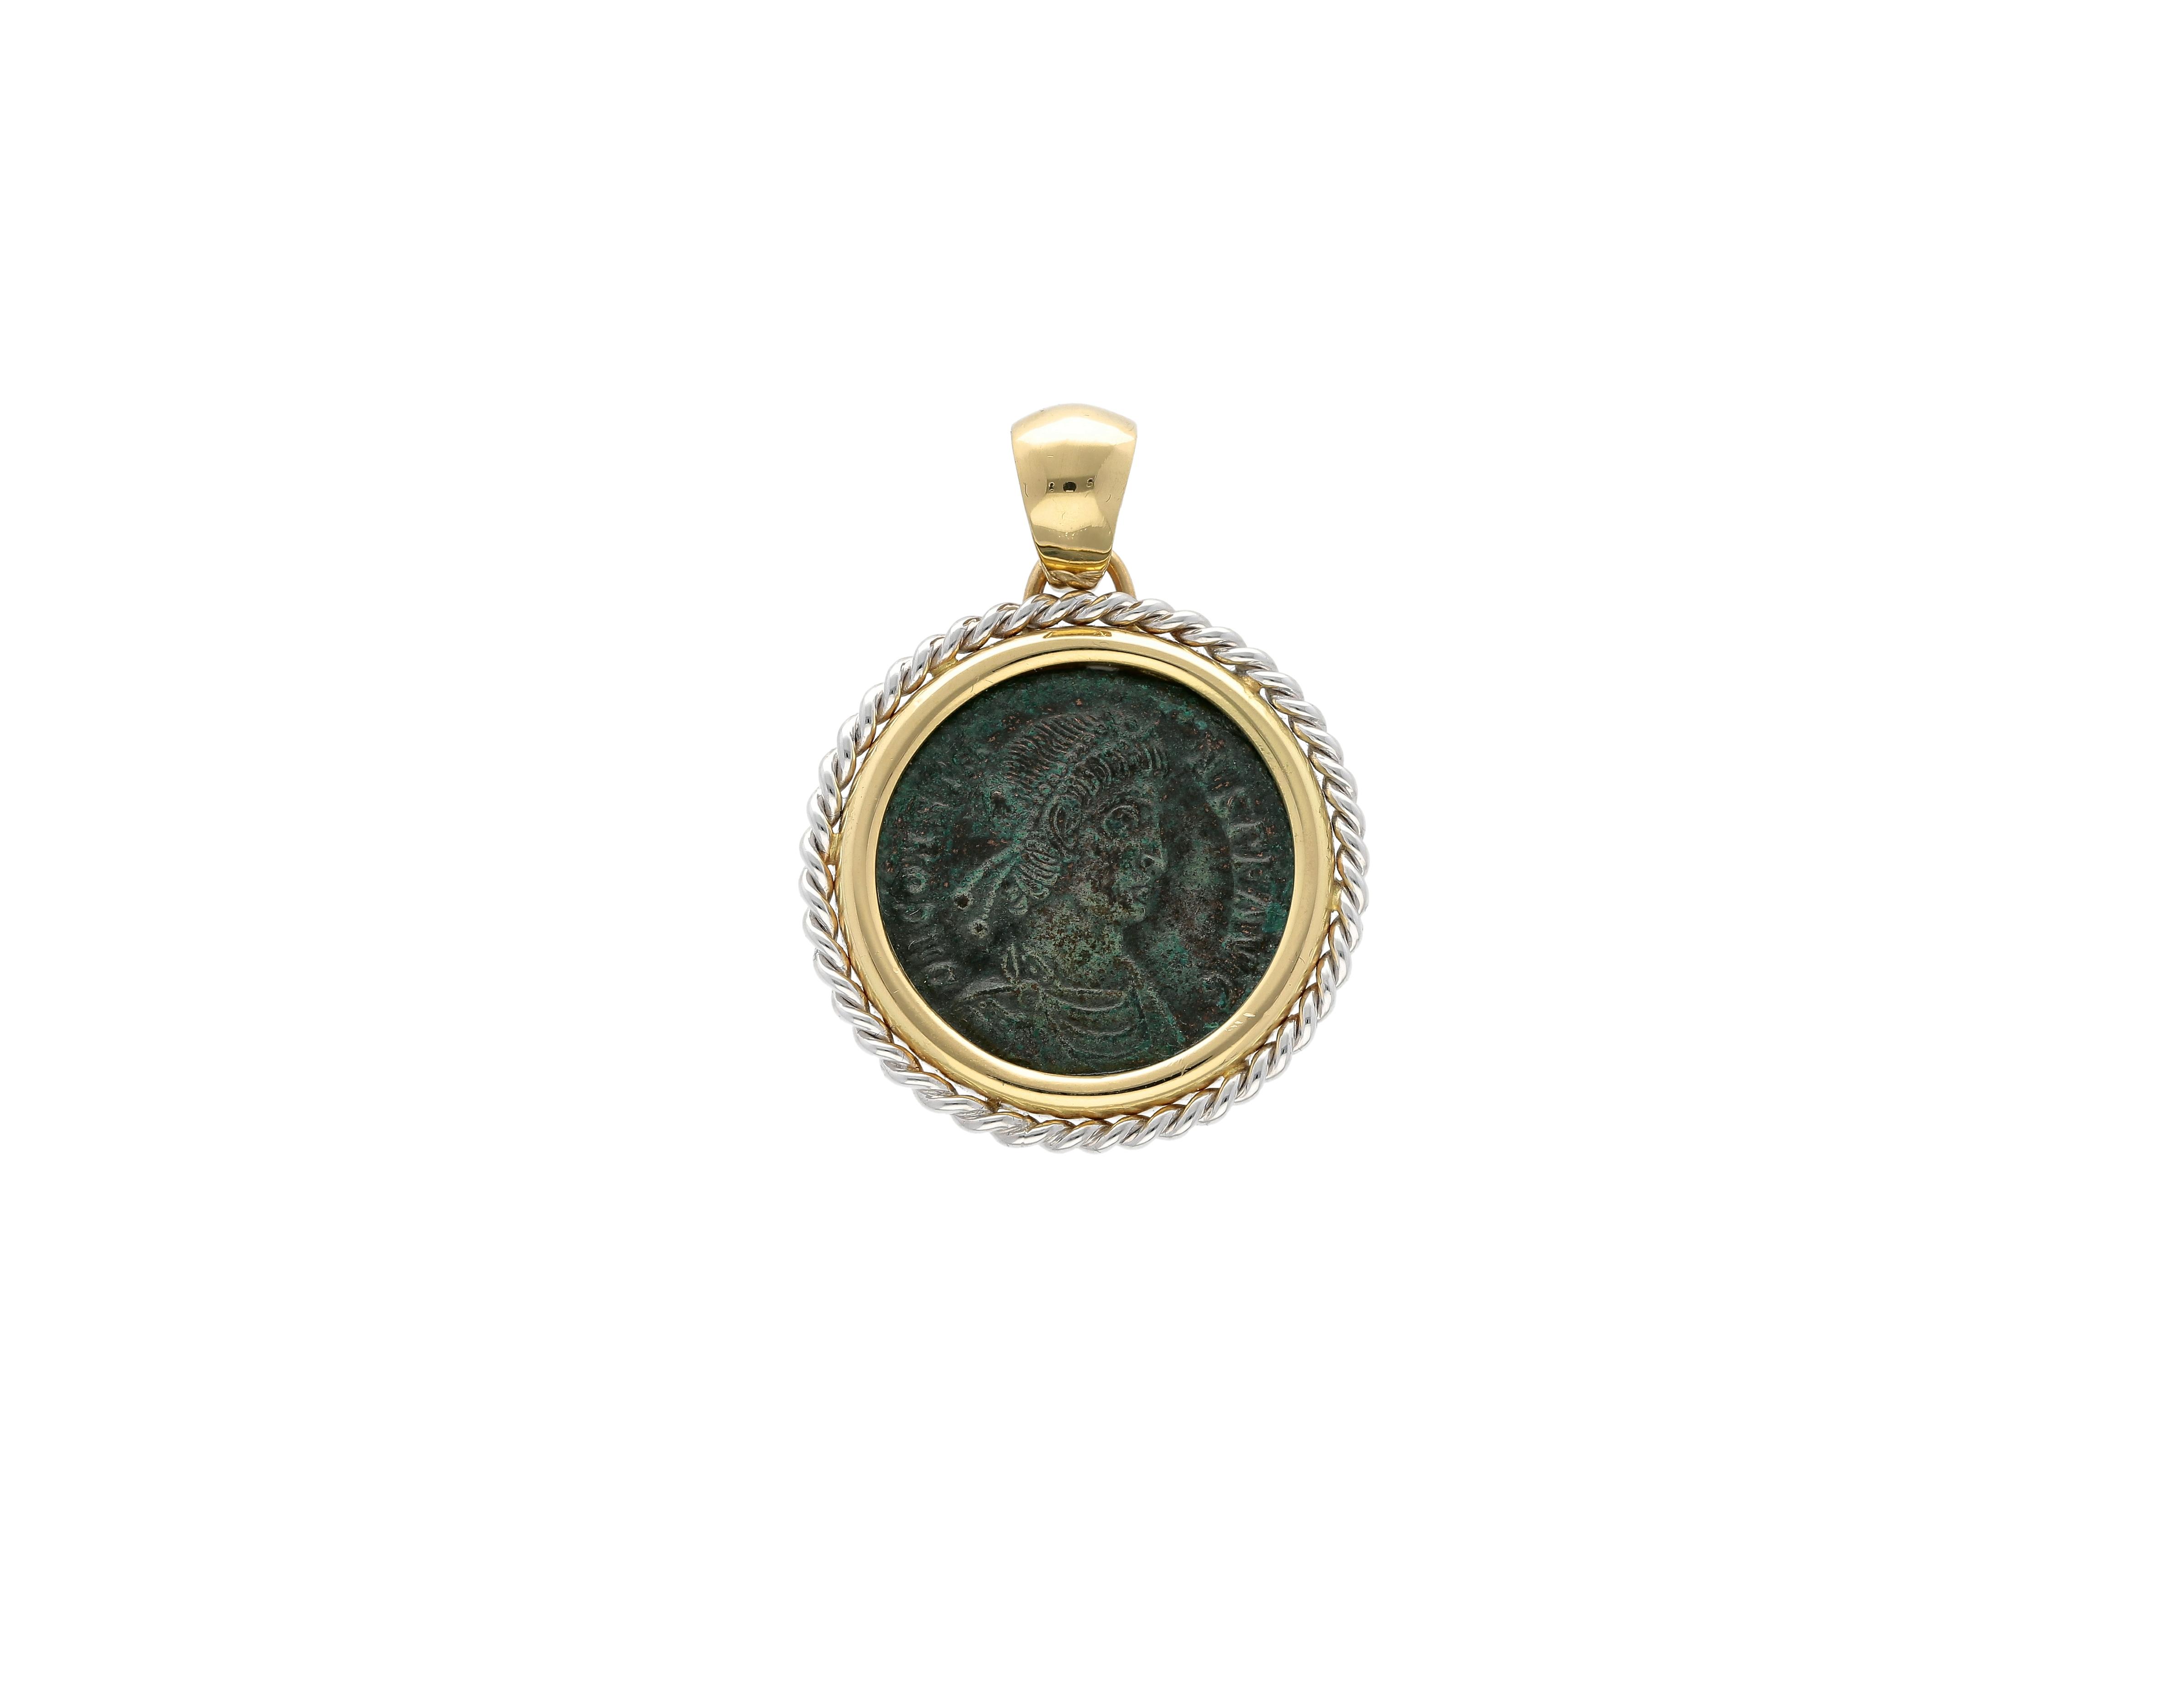 Roman Coin Pendant Emperor Constans in 18kt gold